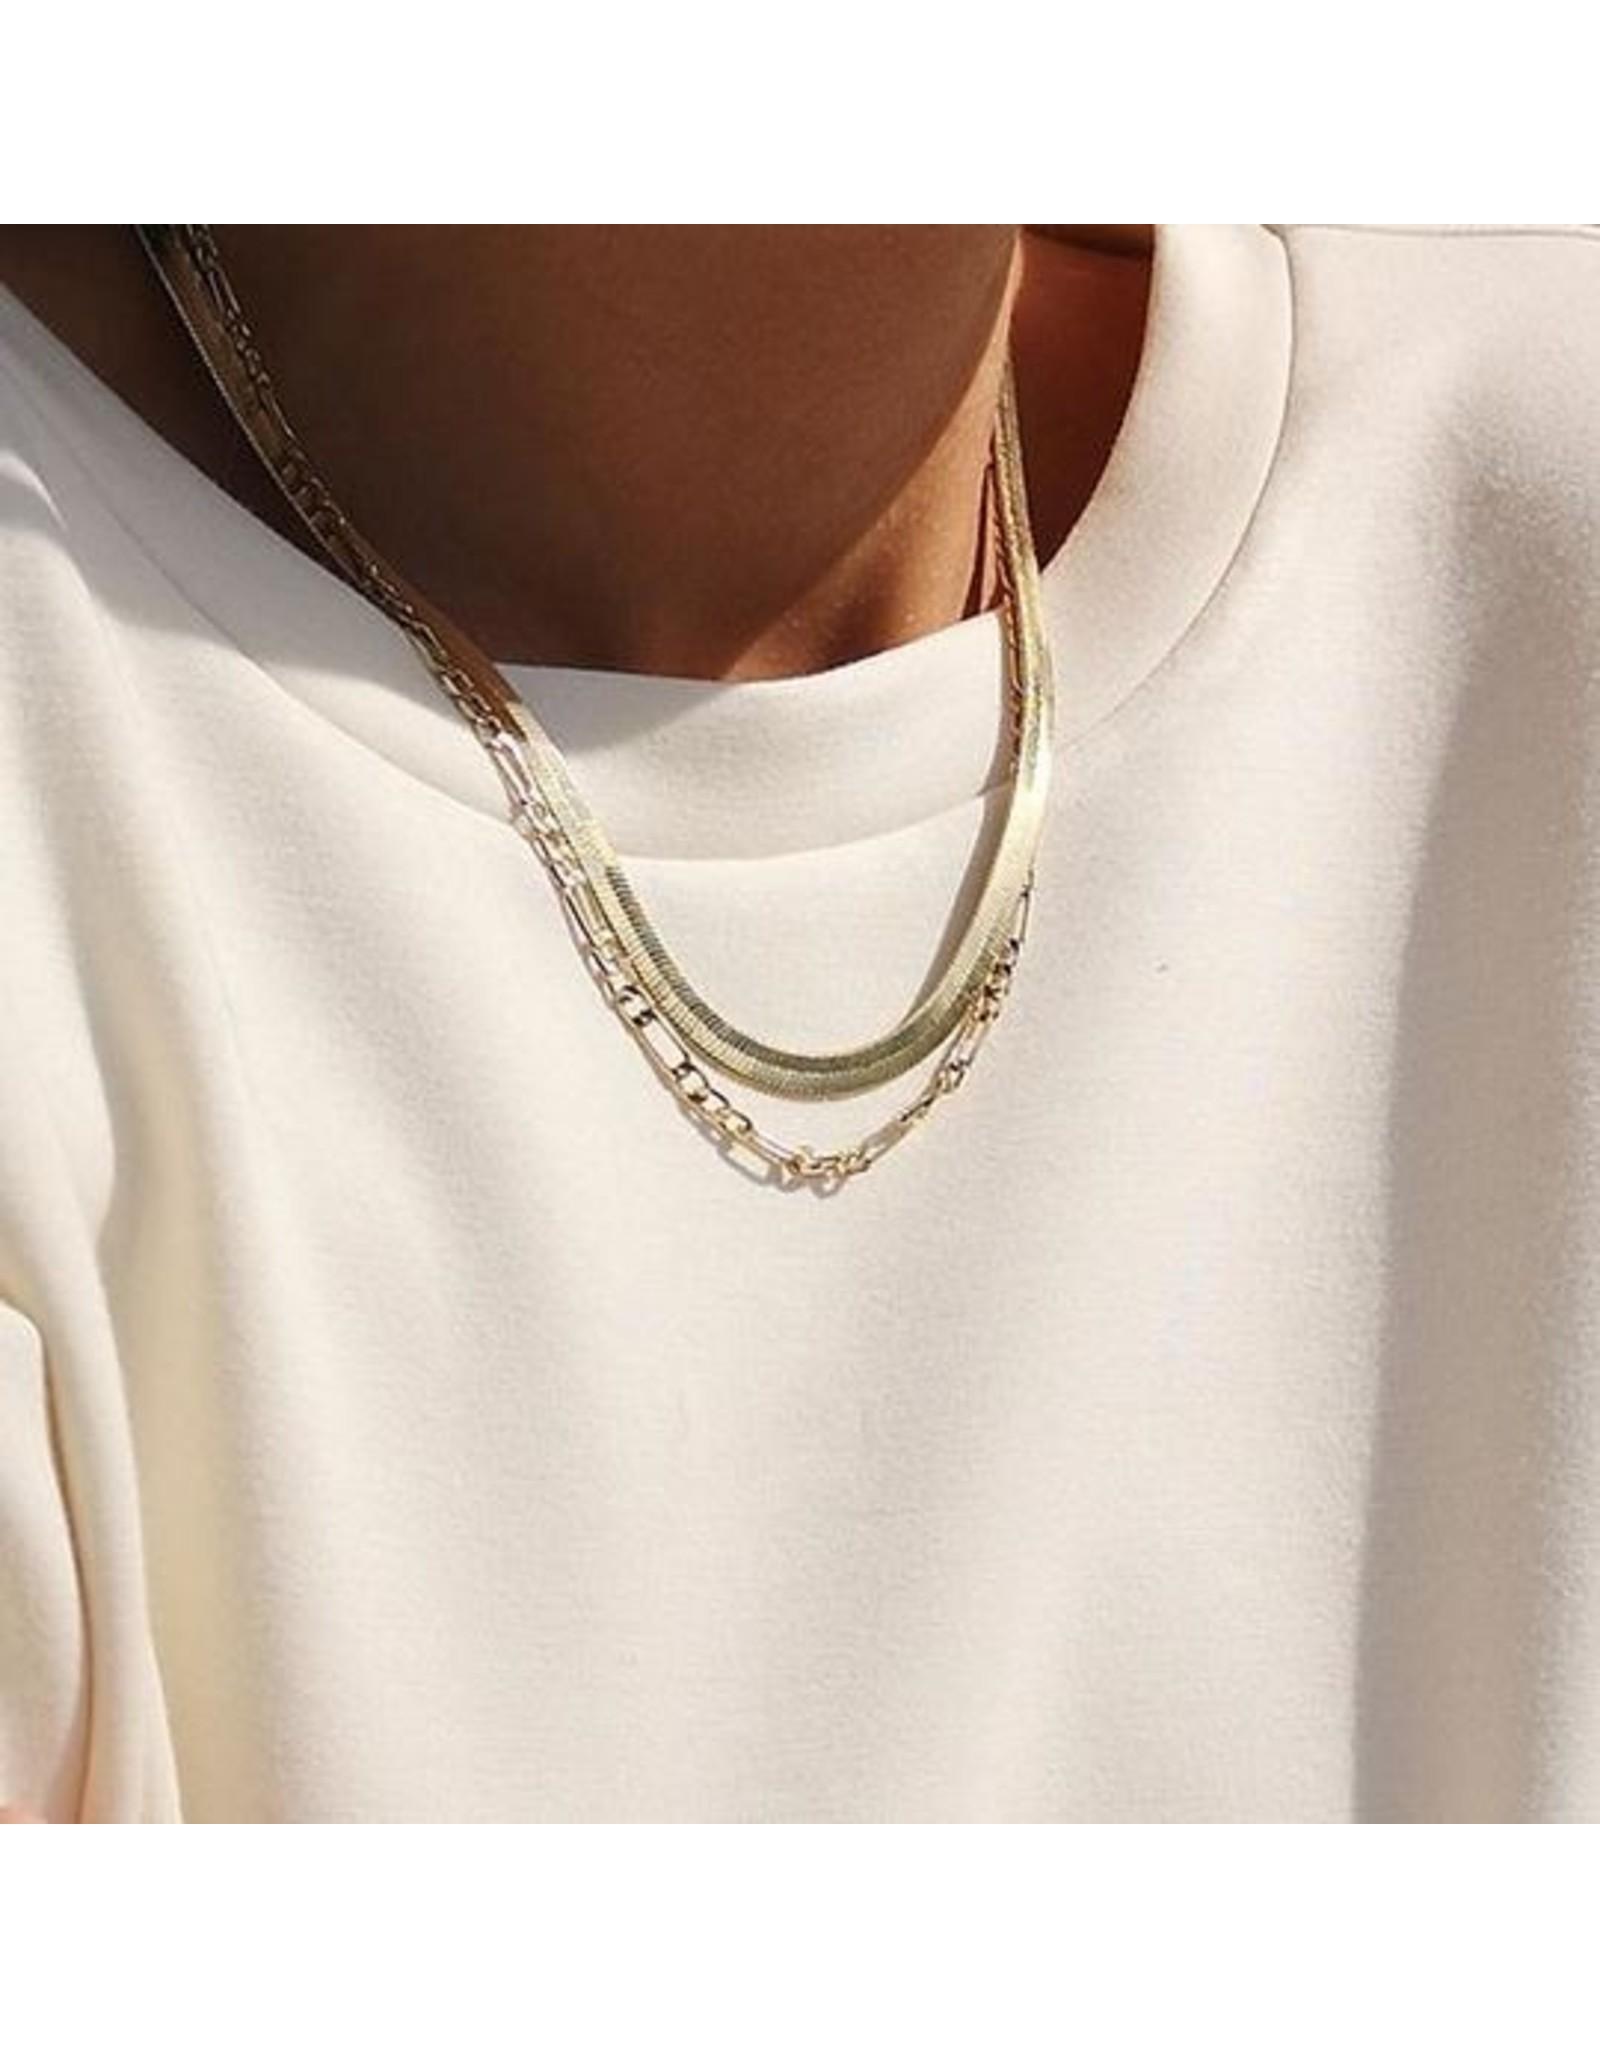 Pilgrim - Yggdrasil Necklace